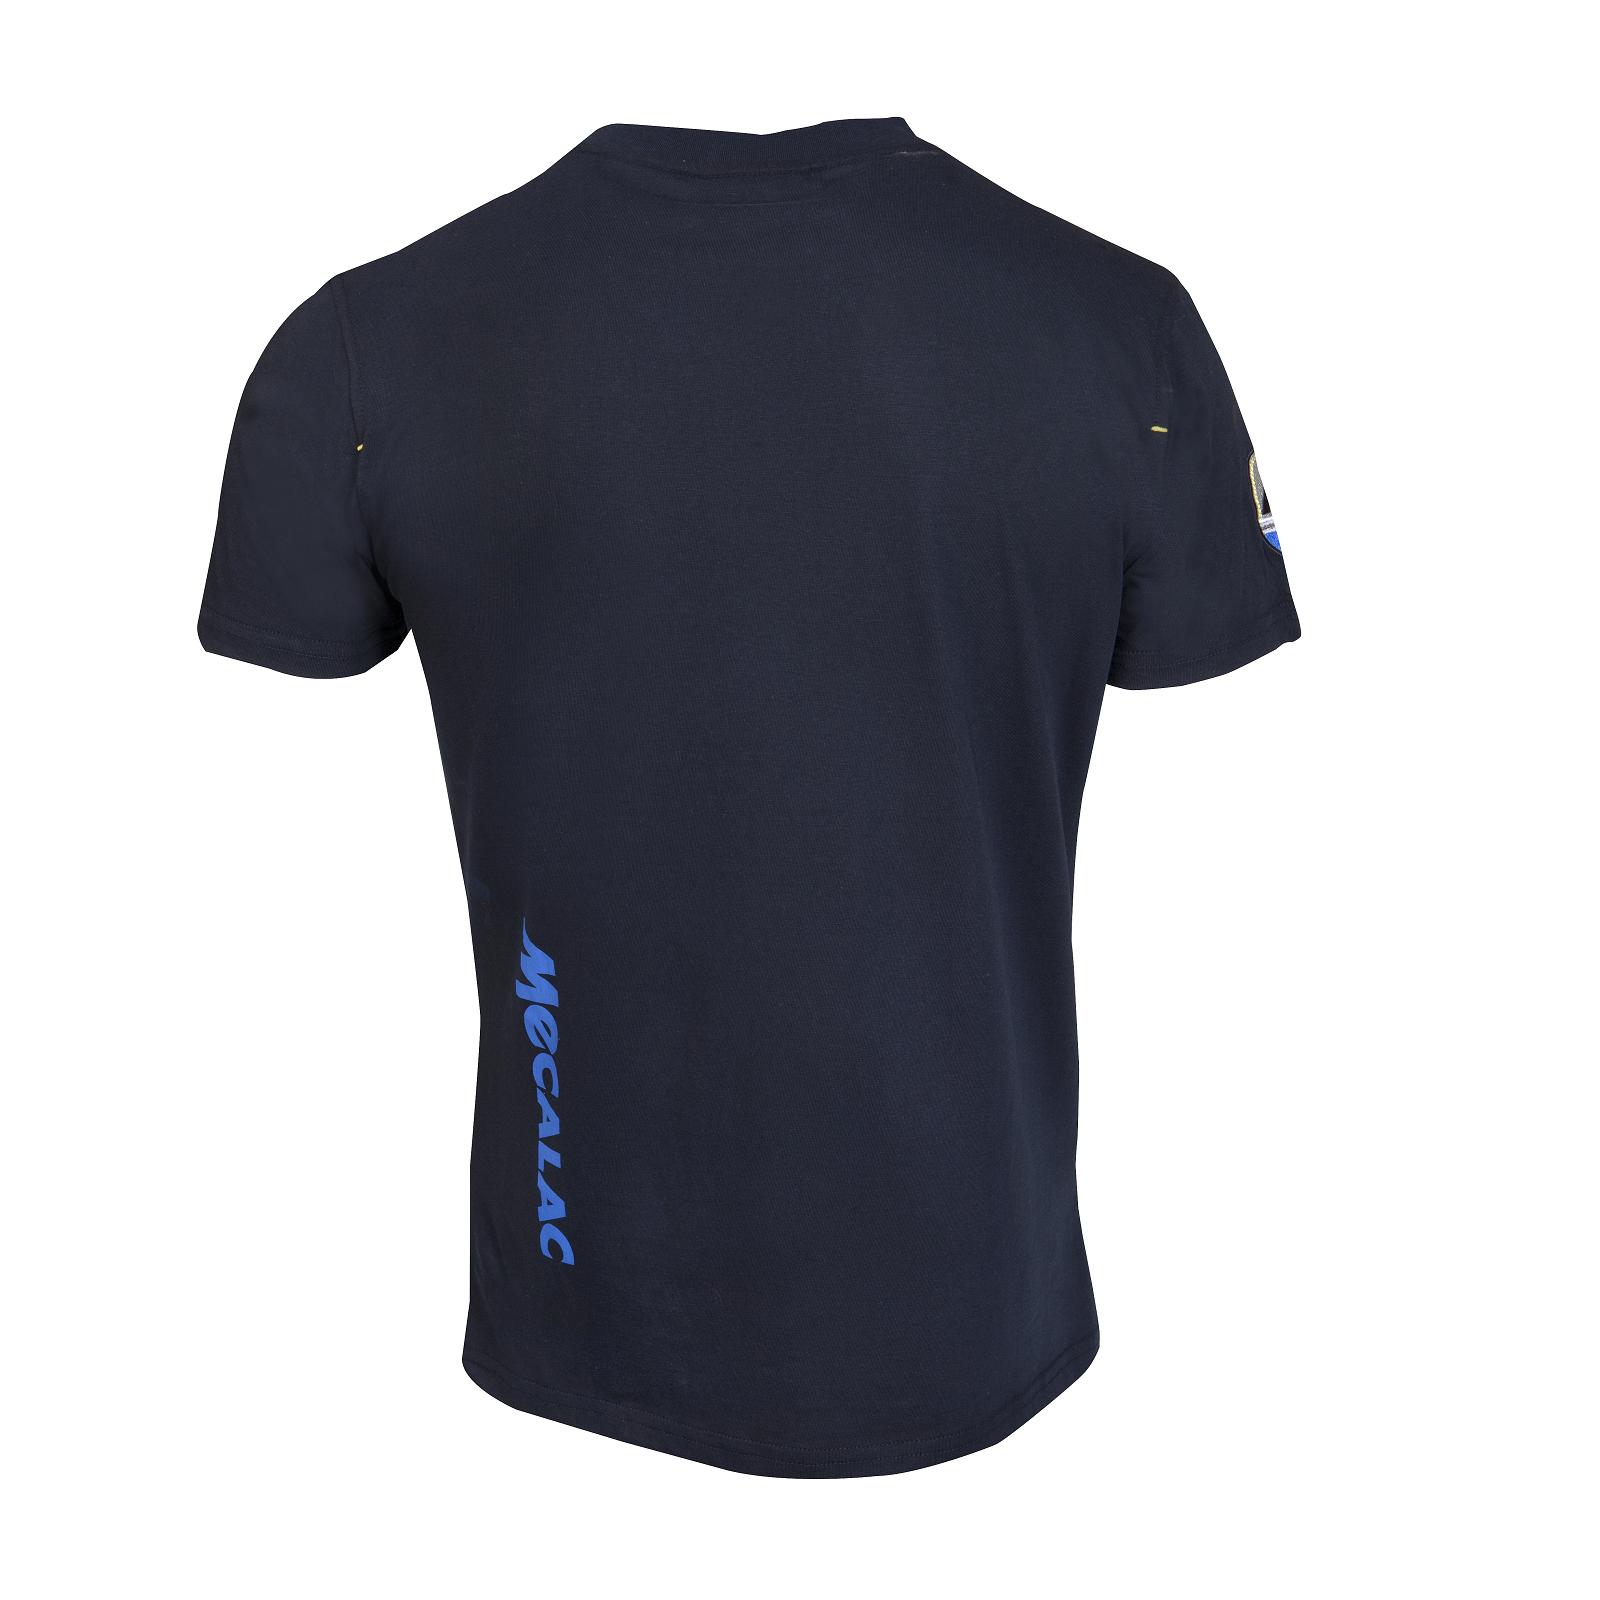 T-shirt Trendy